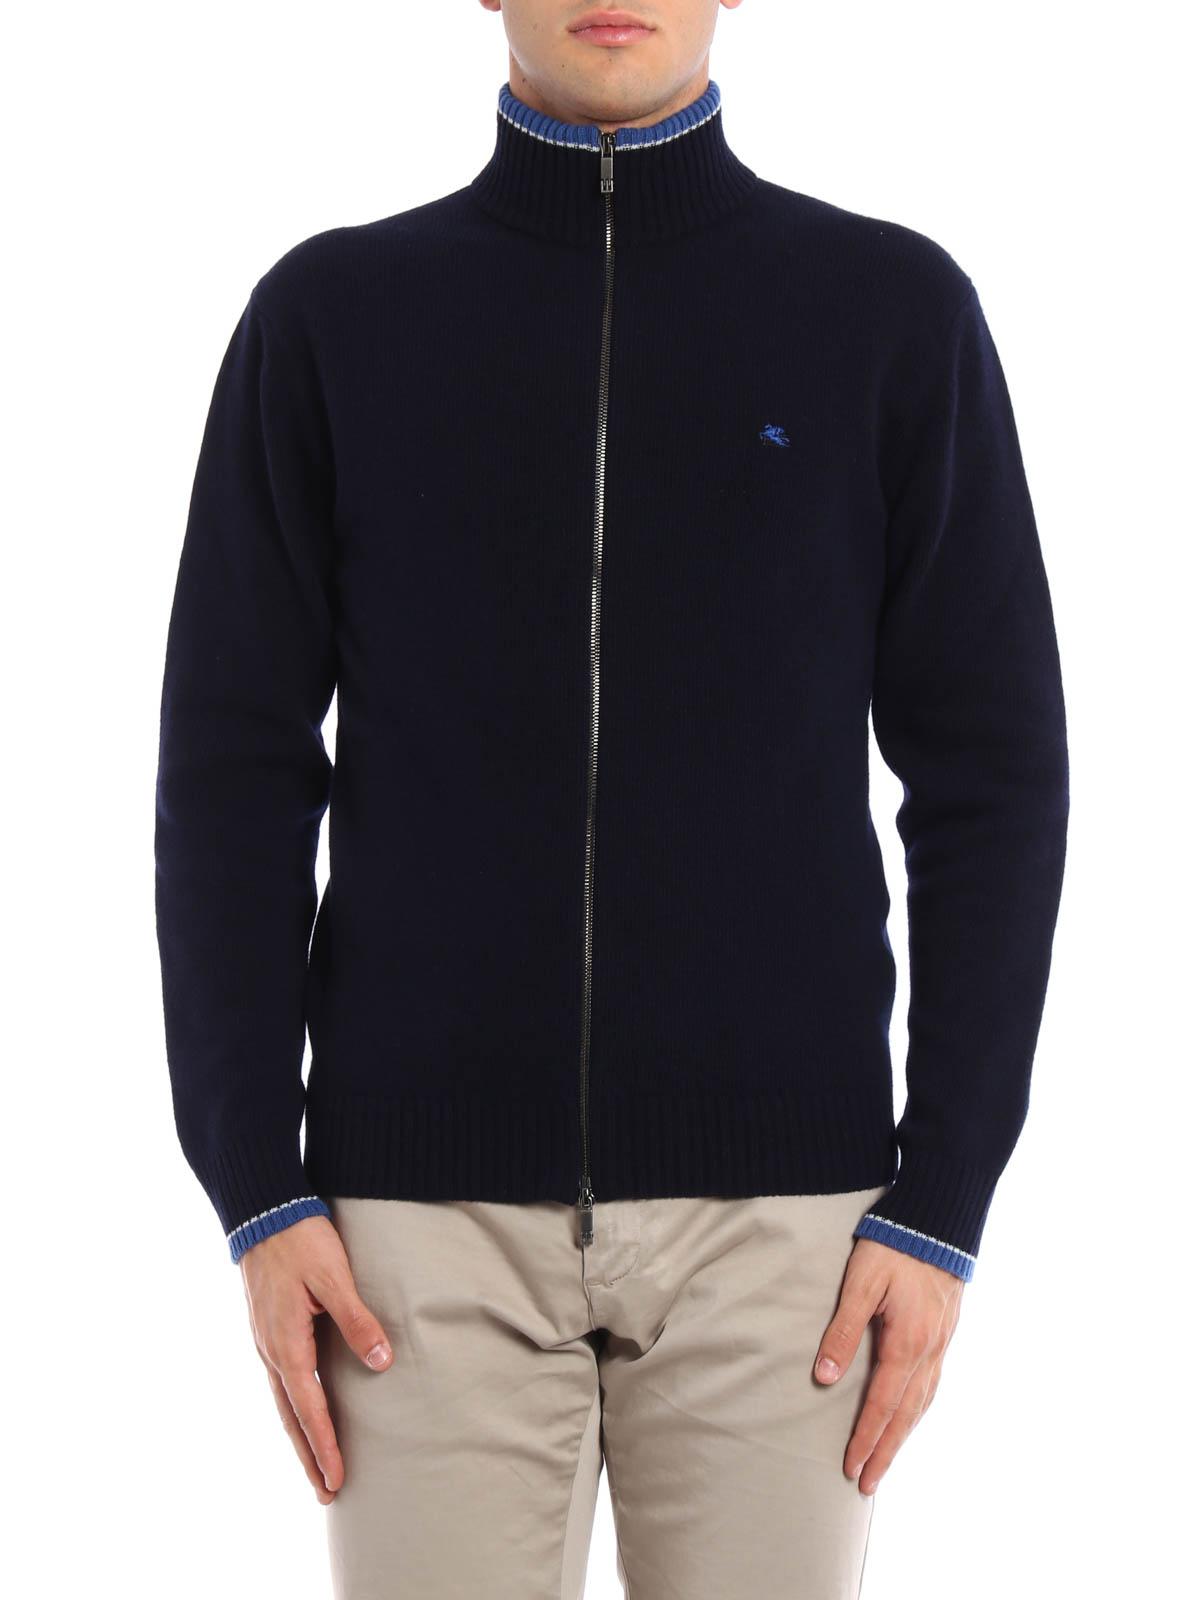 Zipped wool cardigan by Etro - cardigans   iKRIX